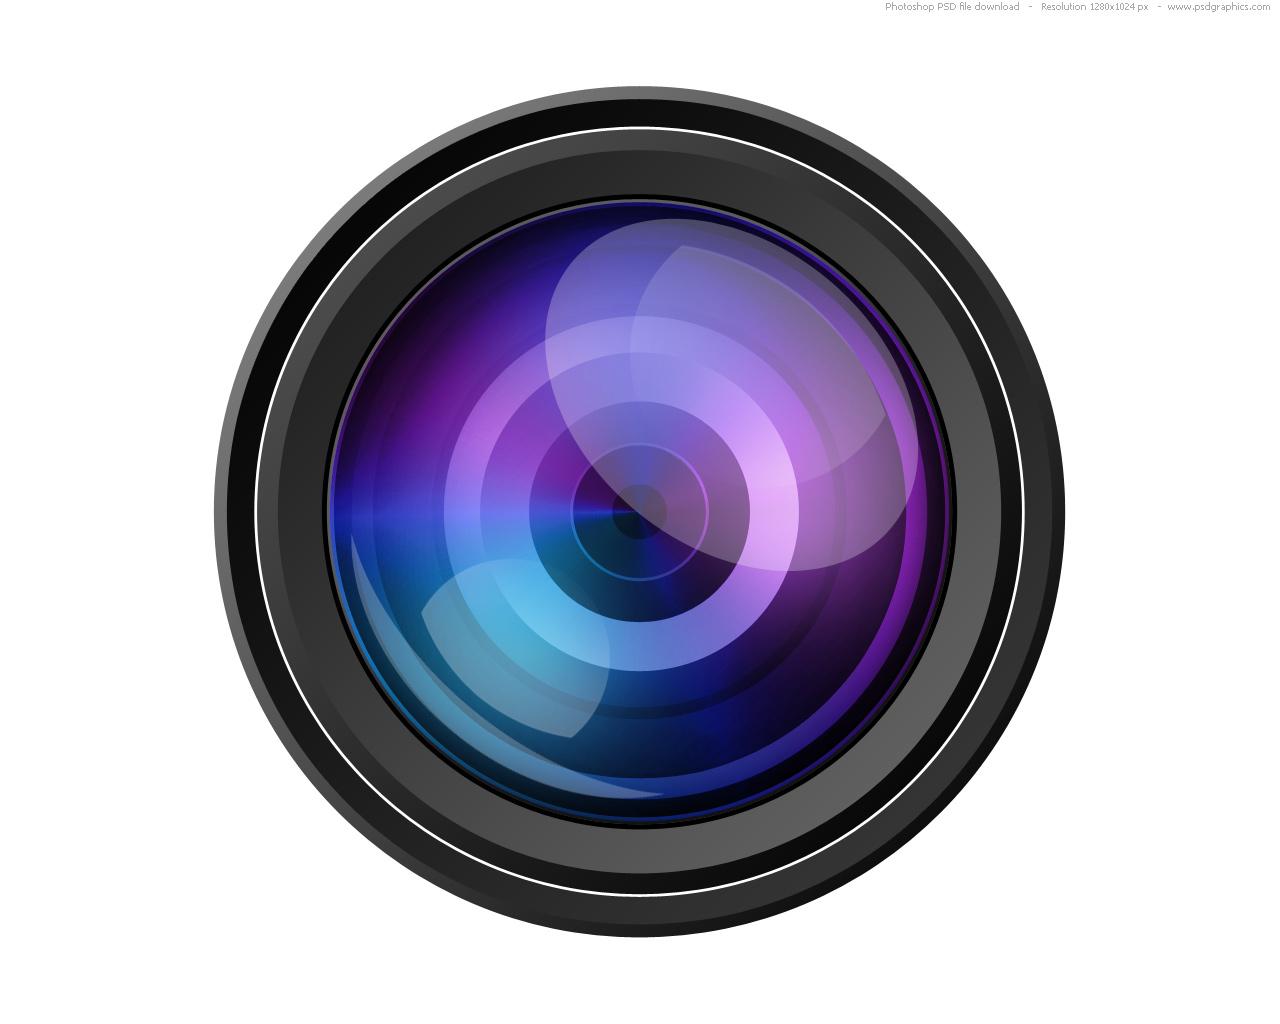 ... Camera lens icon